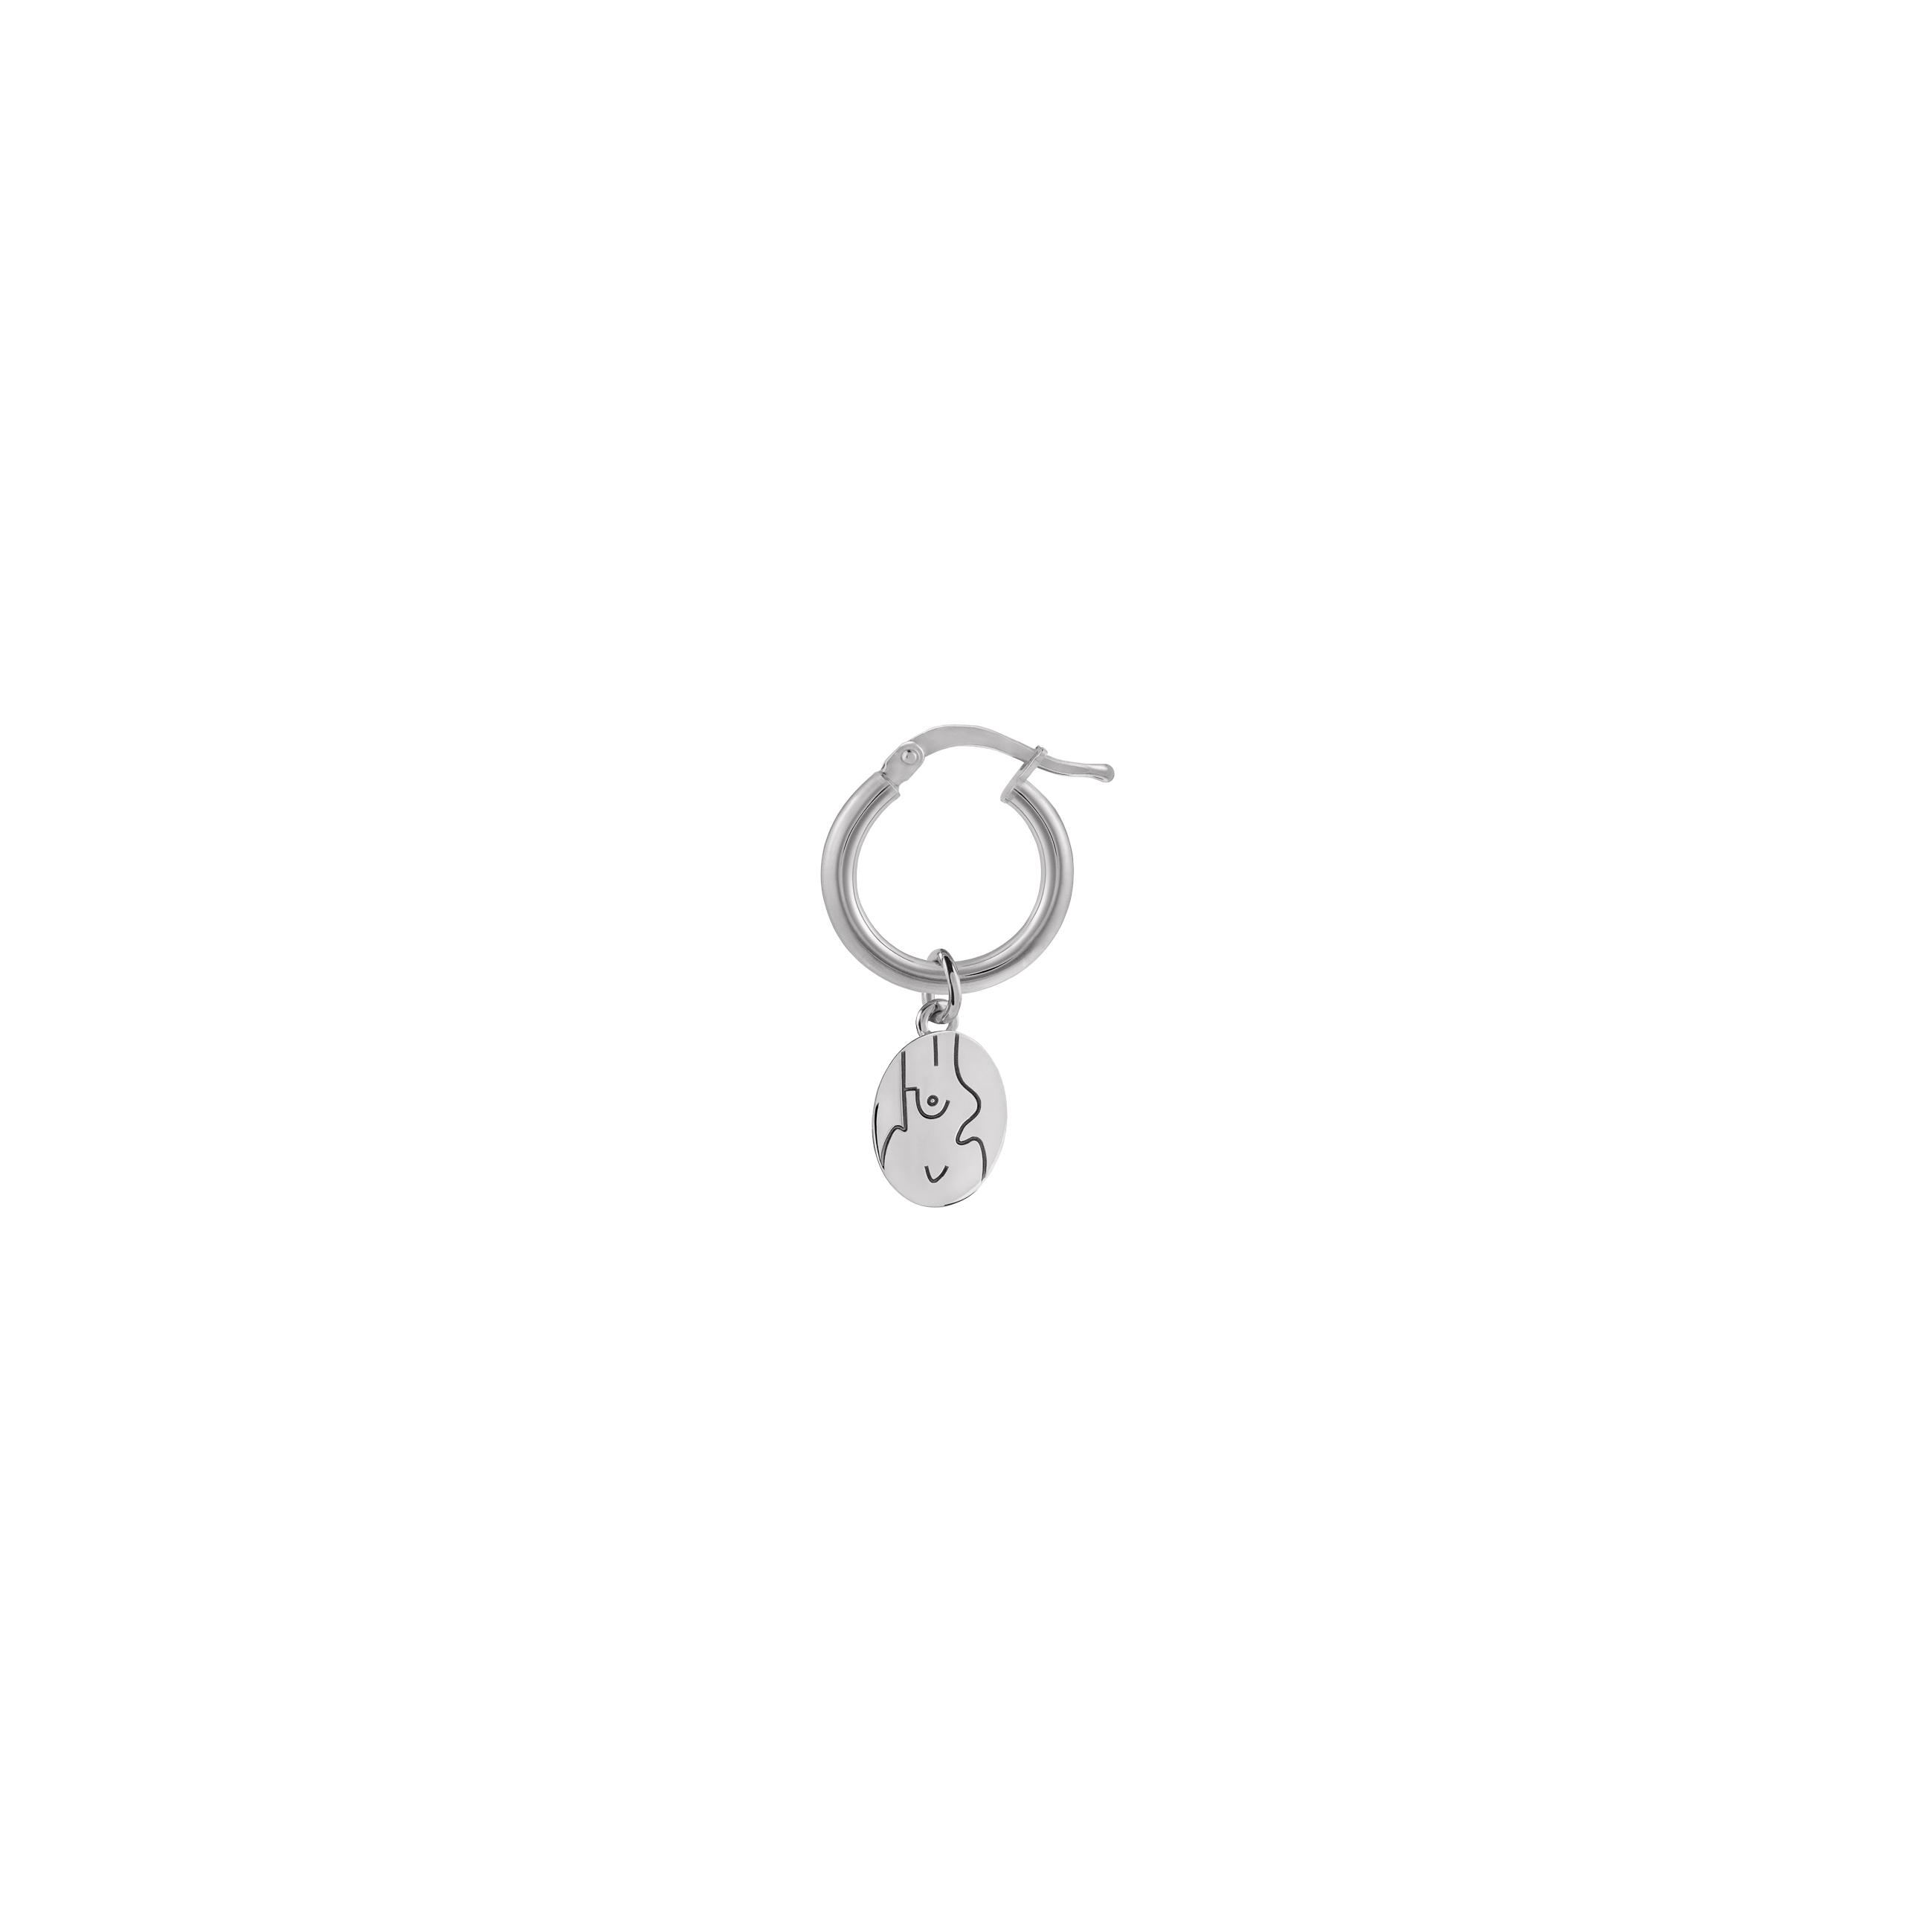 mini Circle féminin / silver